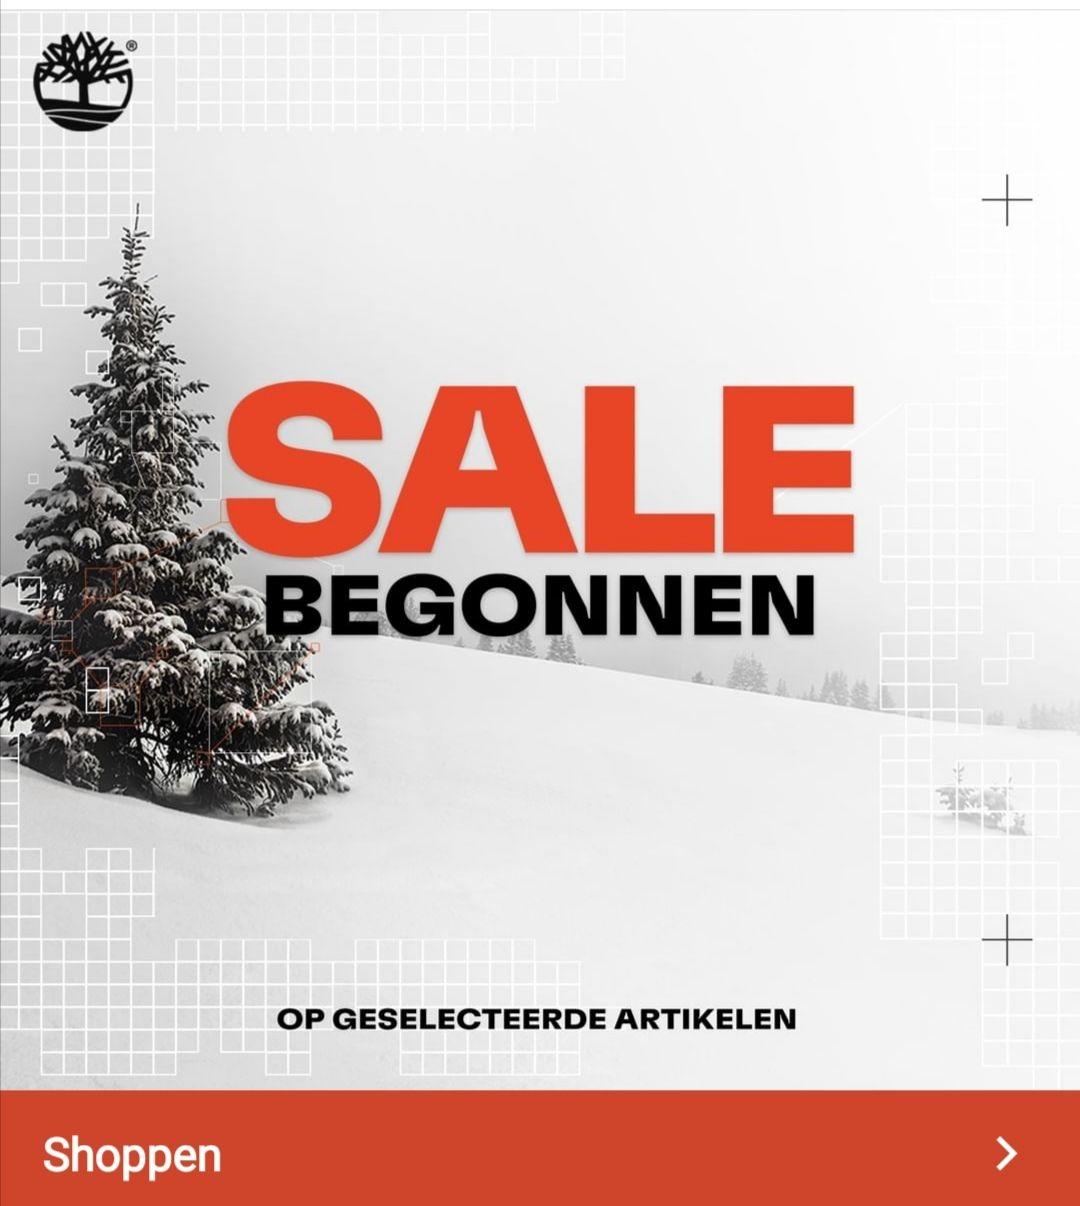 Sale bij timberland tot 50% korting